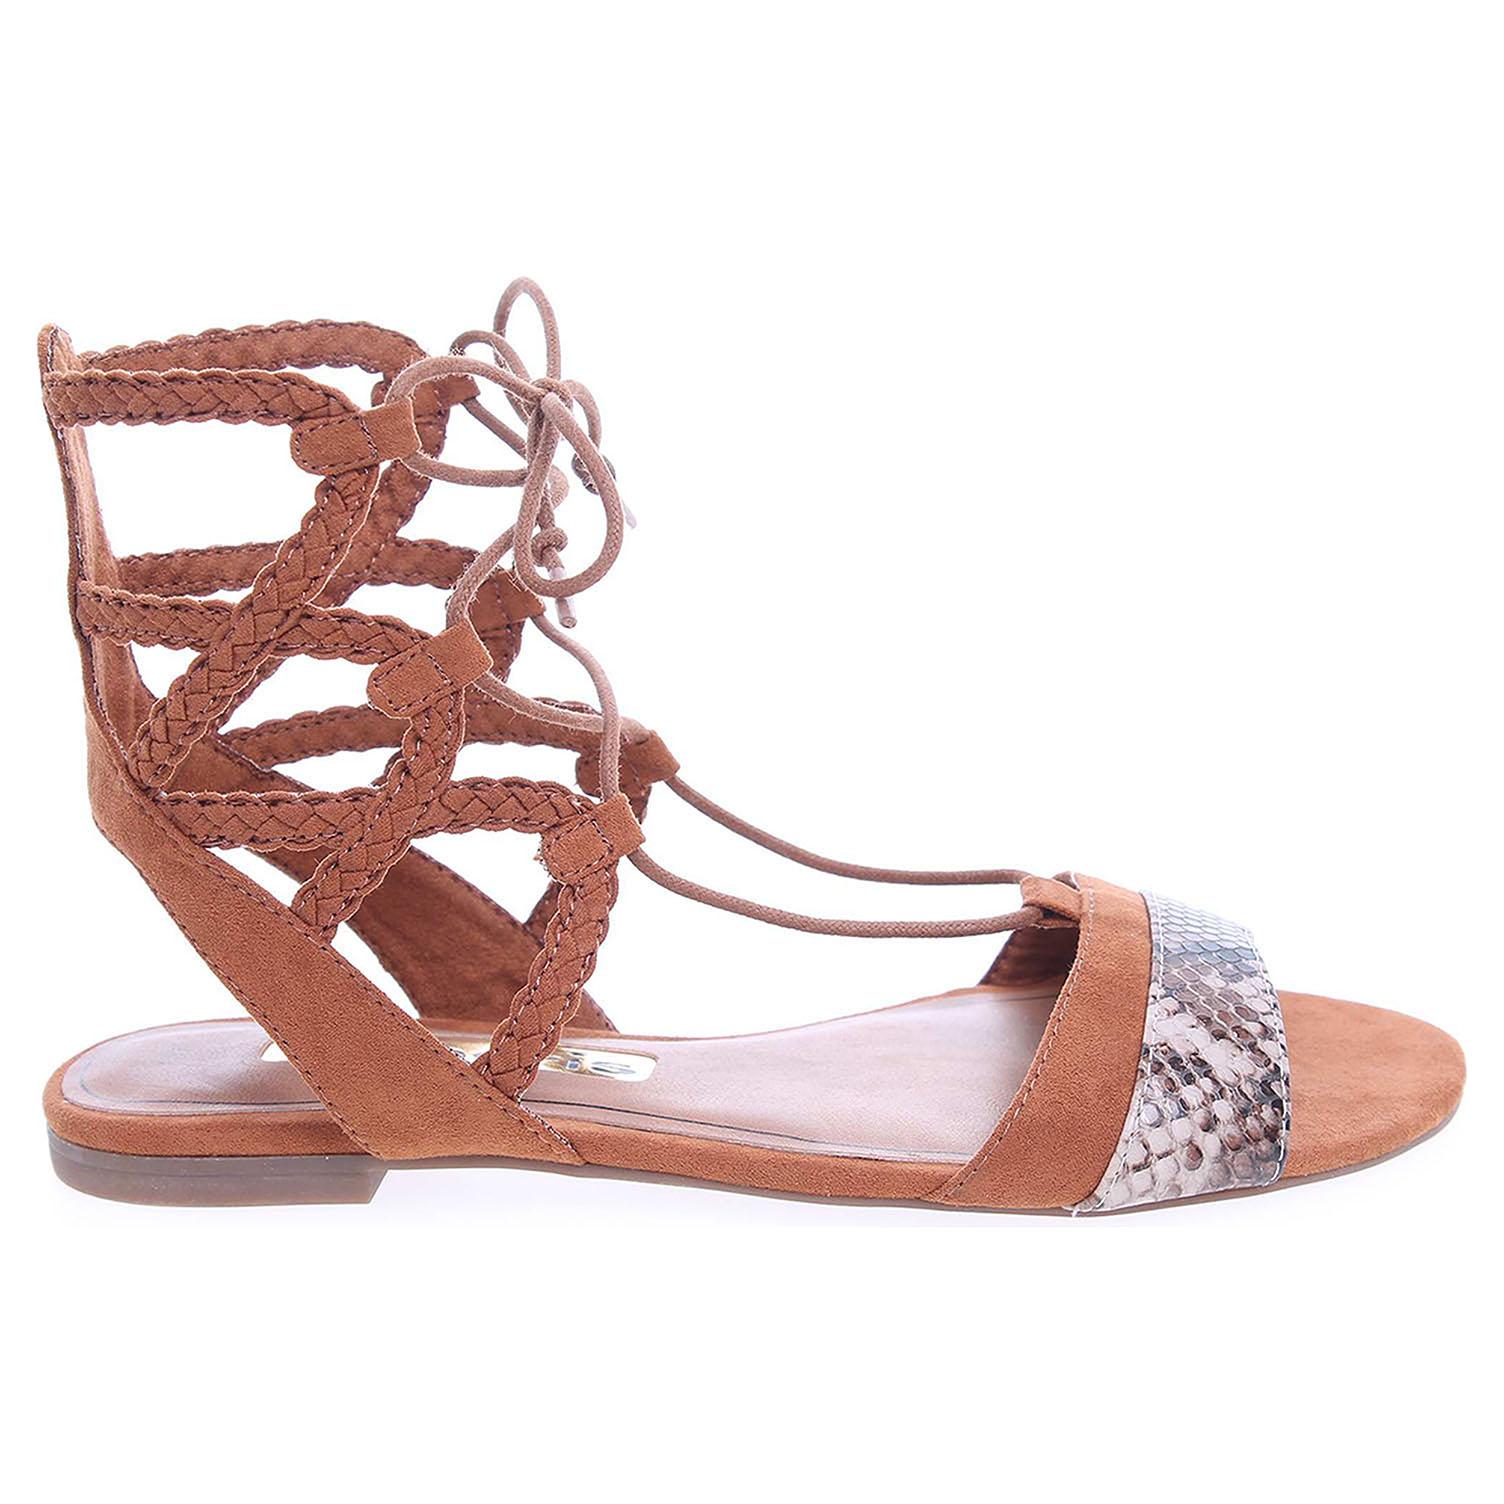 Tamaris dámské sandály 1-28178-36 hnědé 38